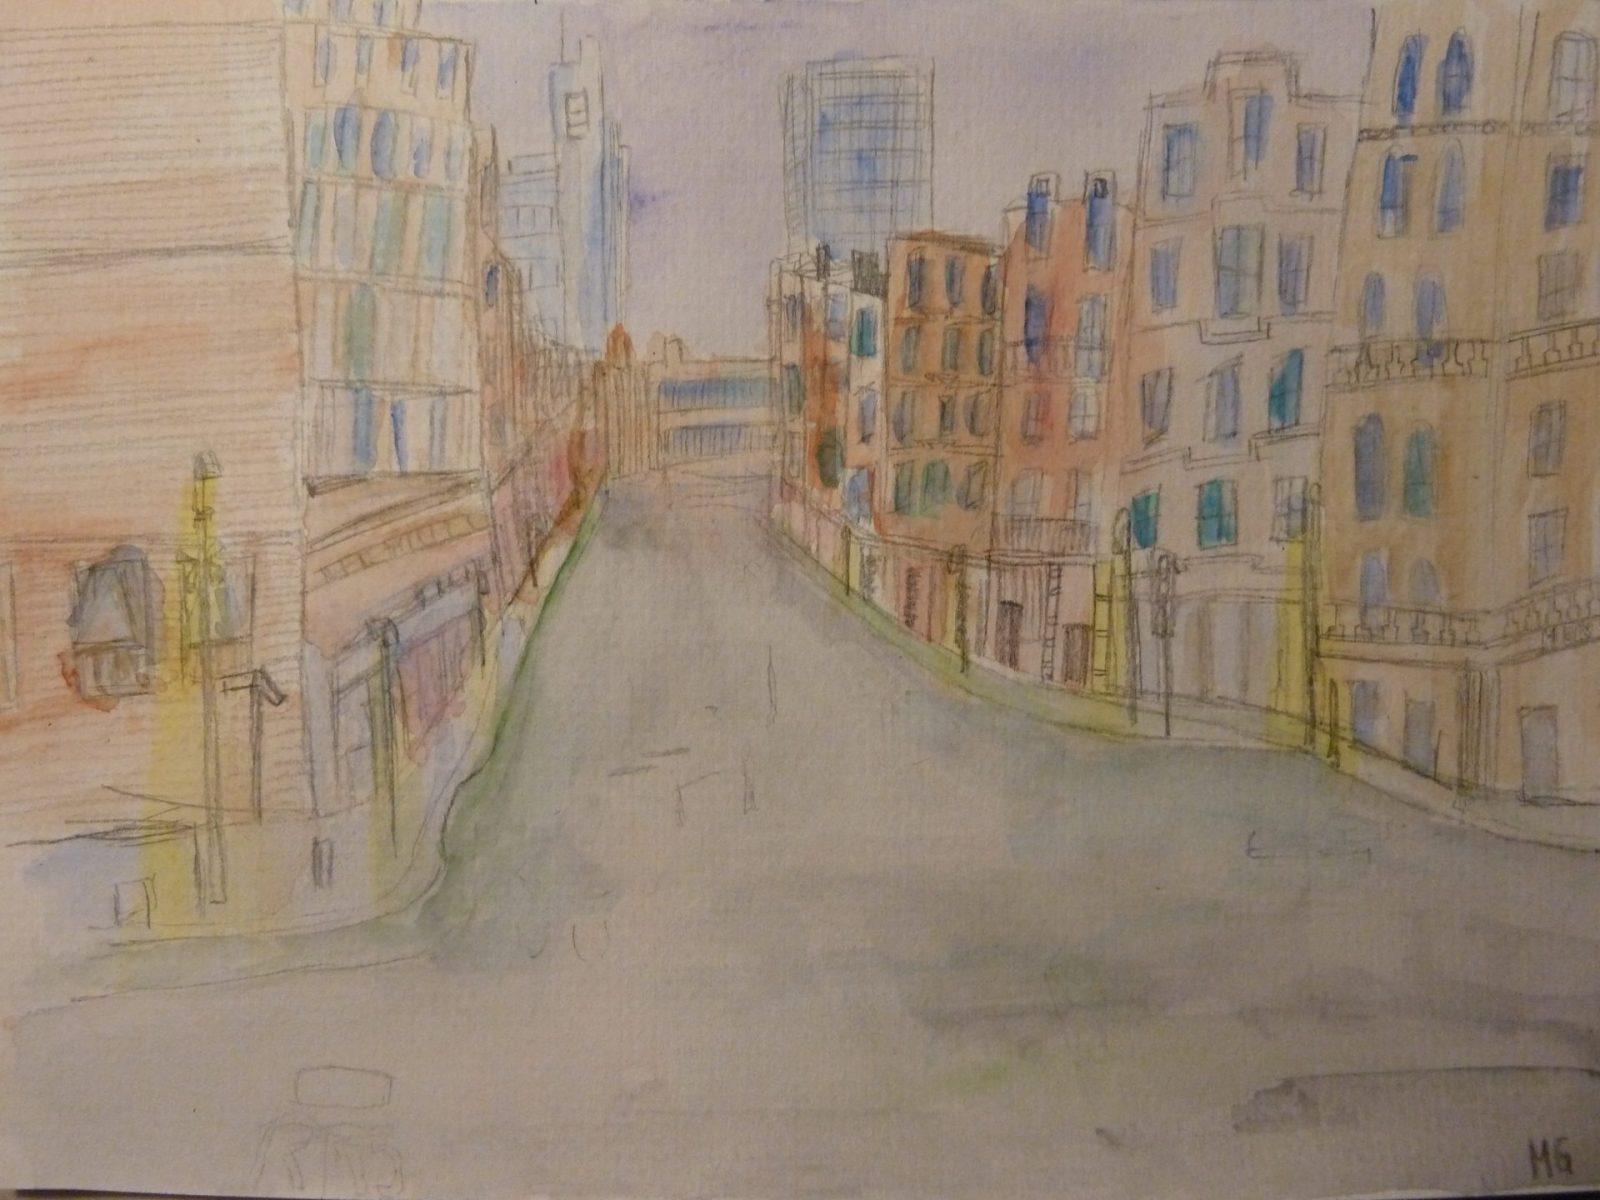 Marlene Grundey, 'Leere Straßen', Bleistift-Aquarell, 11.Kl.